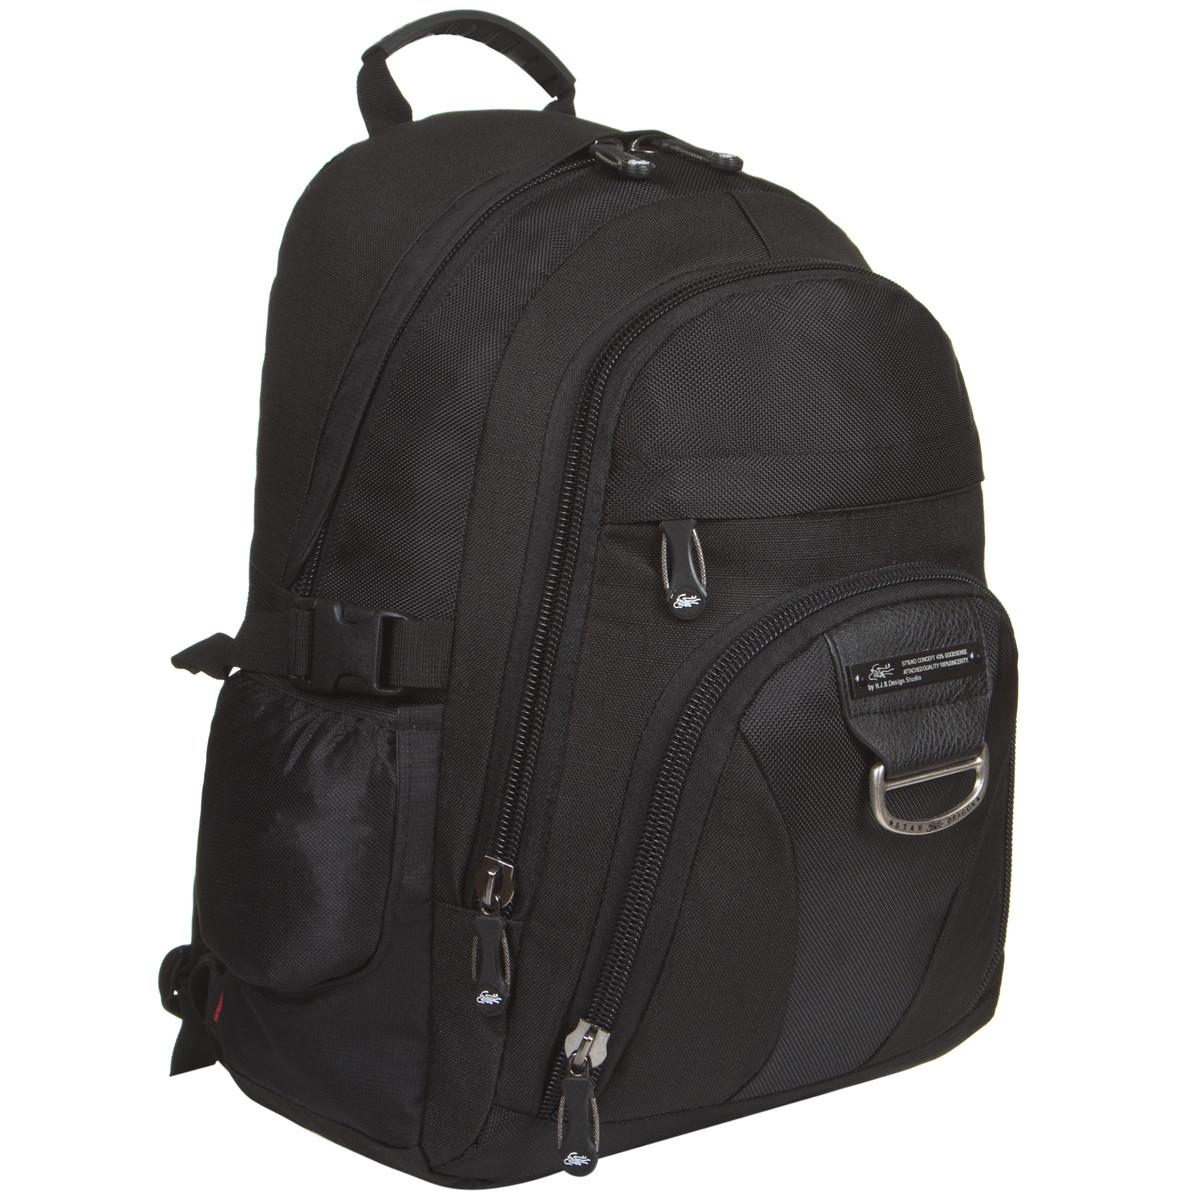 Рюкзак Star Dragon универсальный  40х30х16 ткань полиестер   ксА697ч